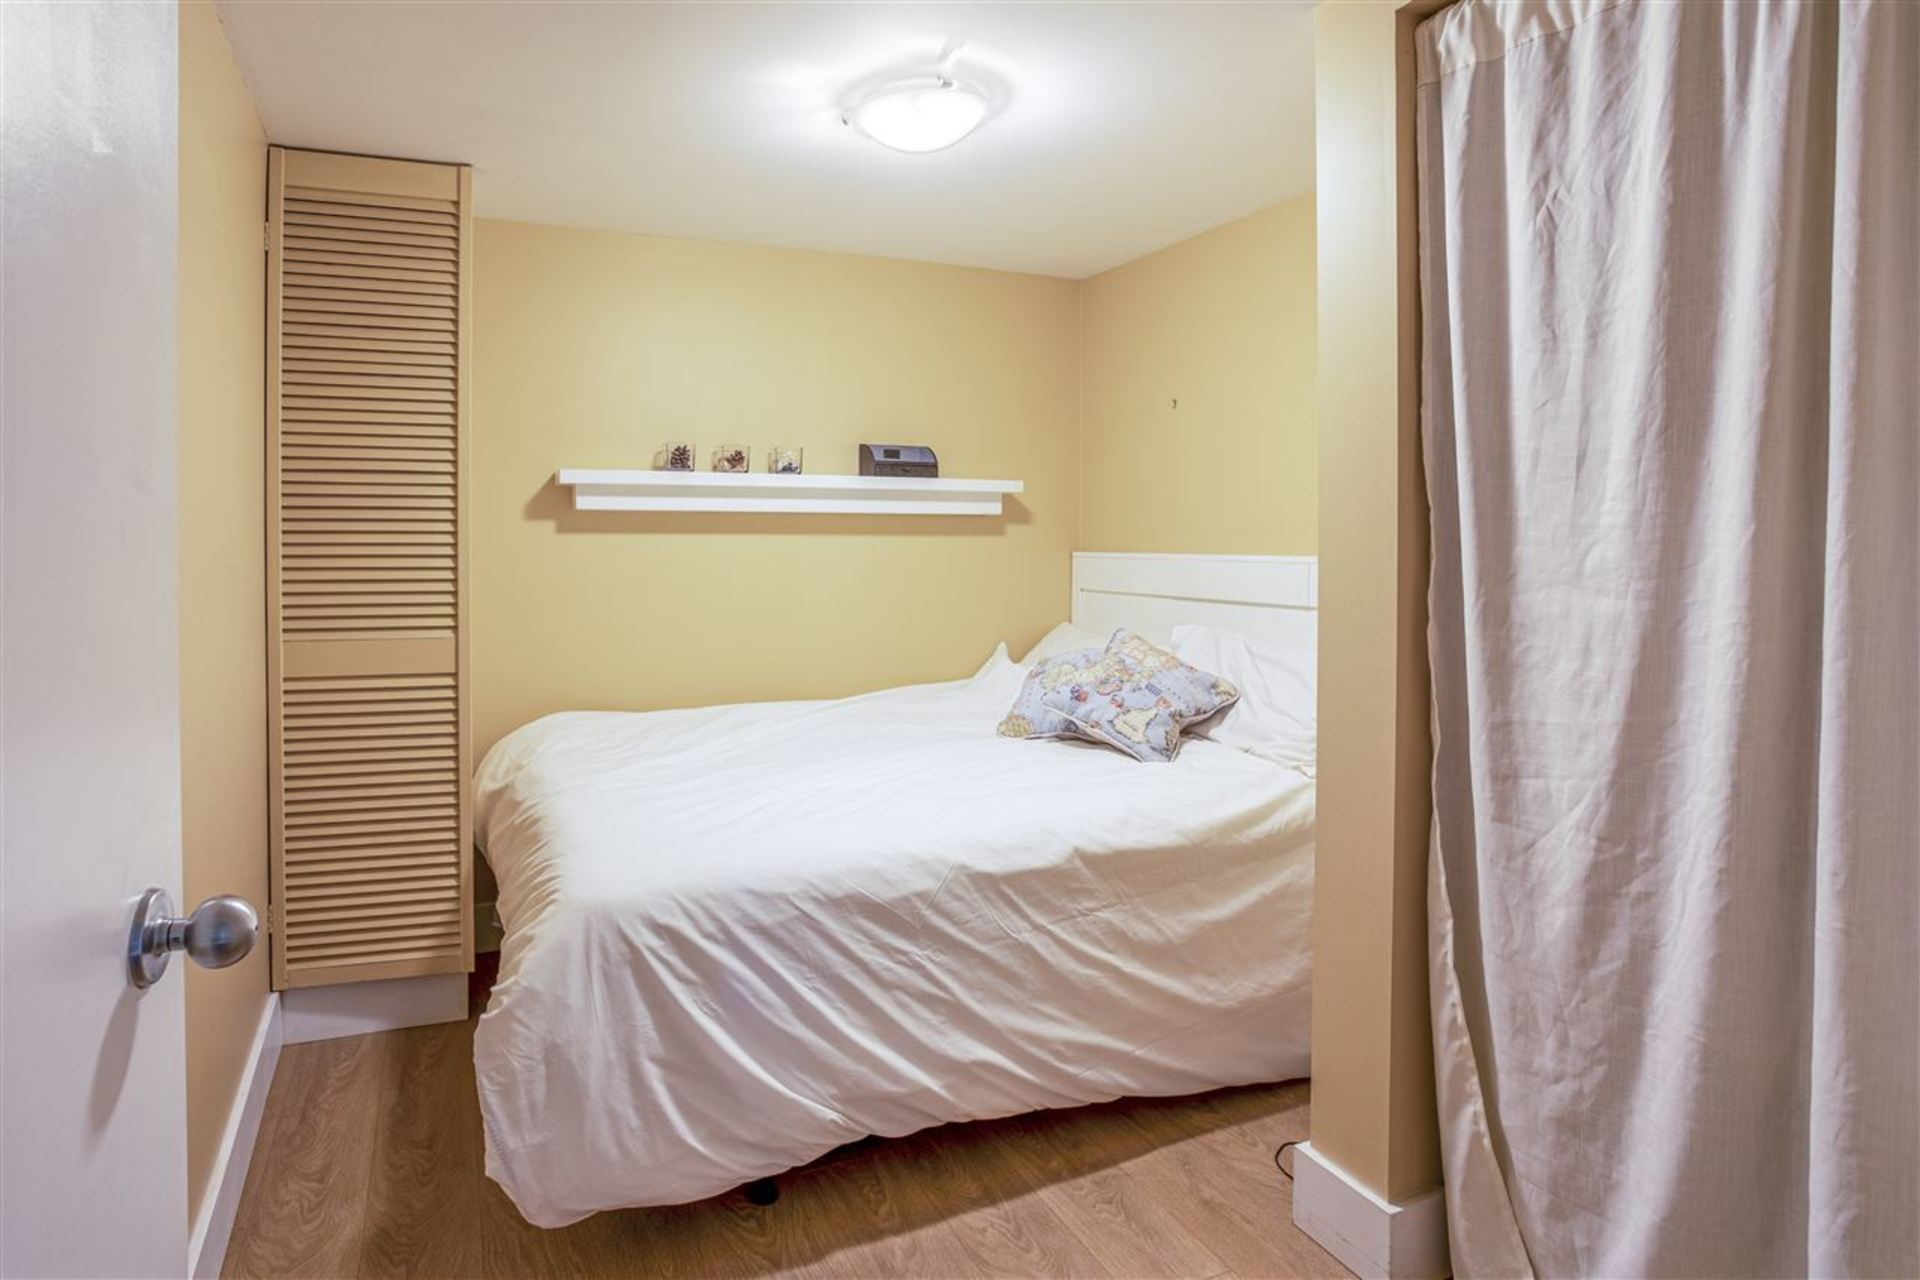 3912-parker-street-willingdon-heights-burnaby-north-13 at 3912 Parker Street, Willingdon Heights, Burnaby North